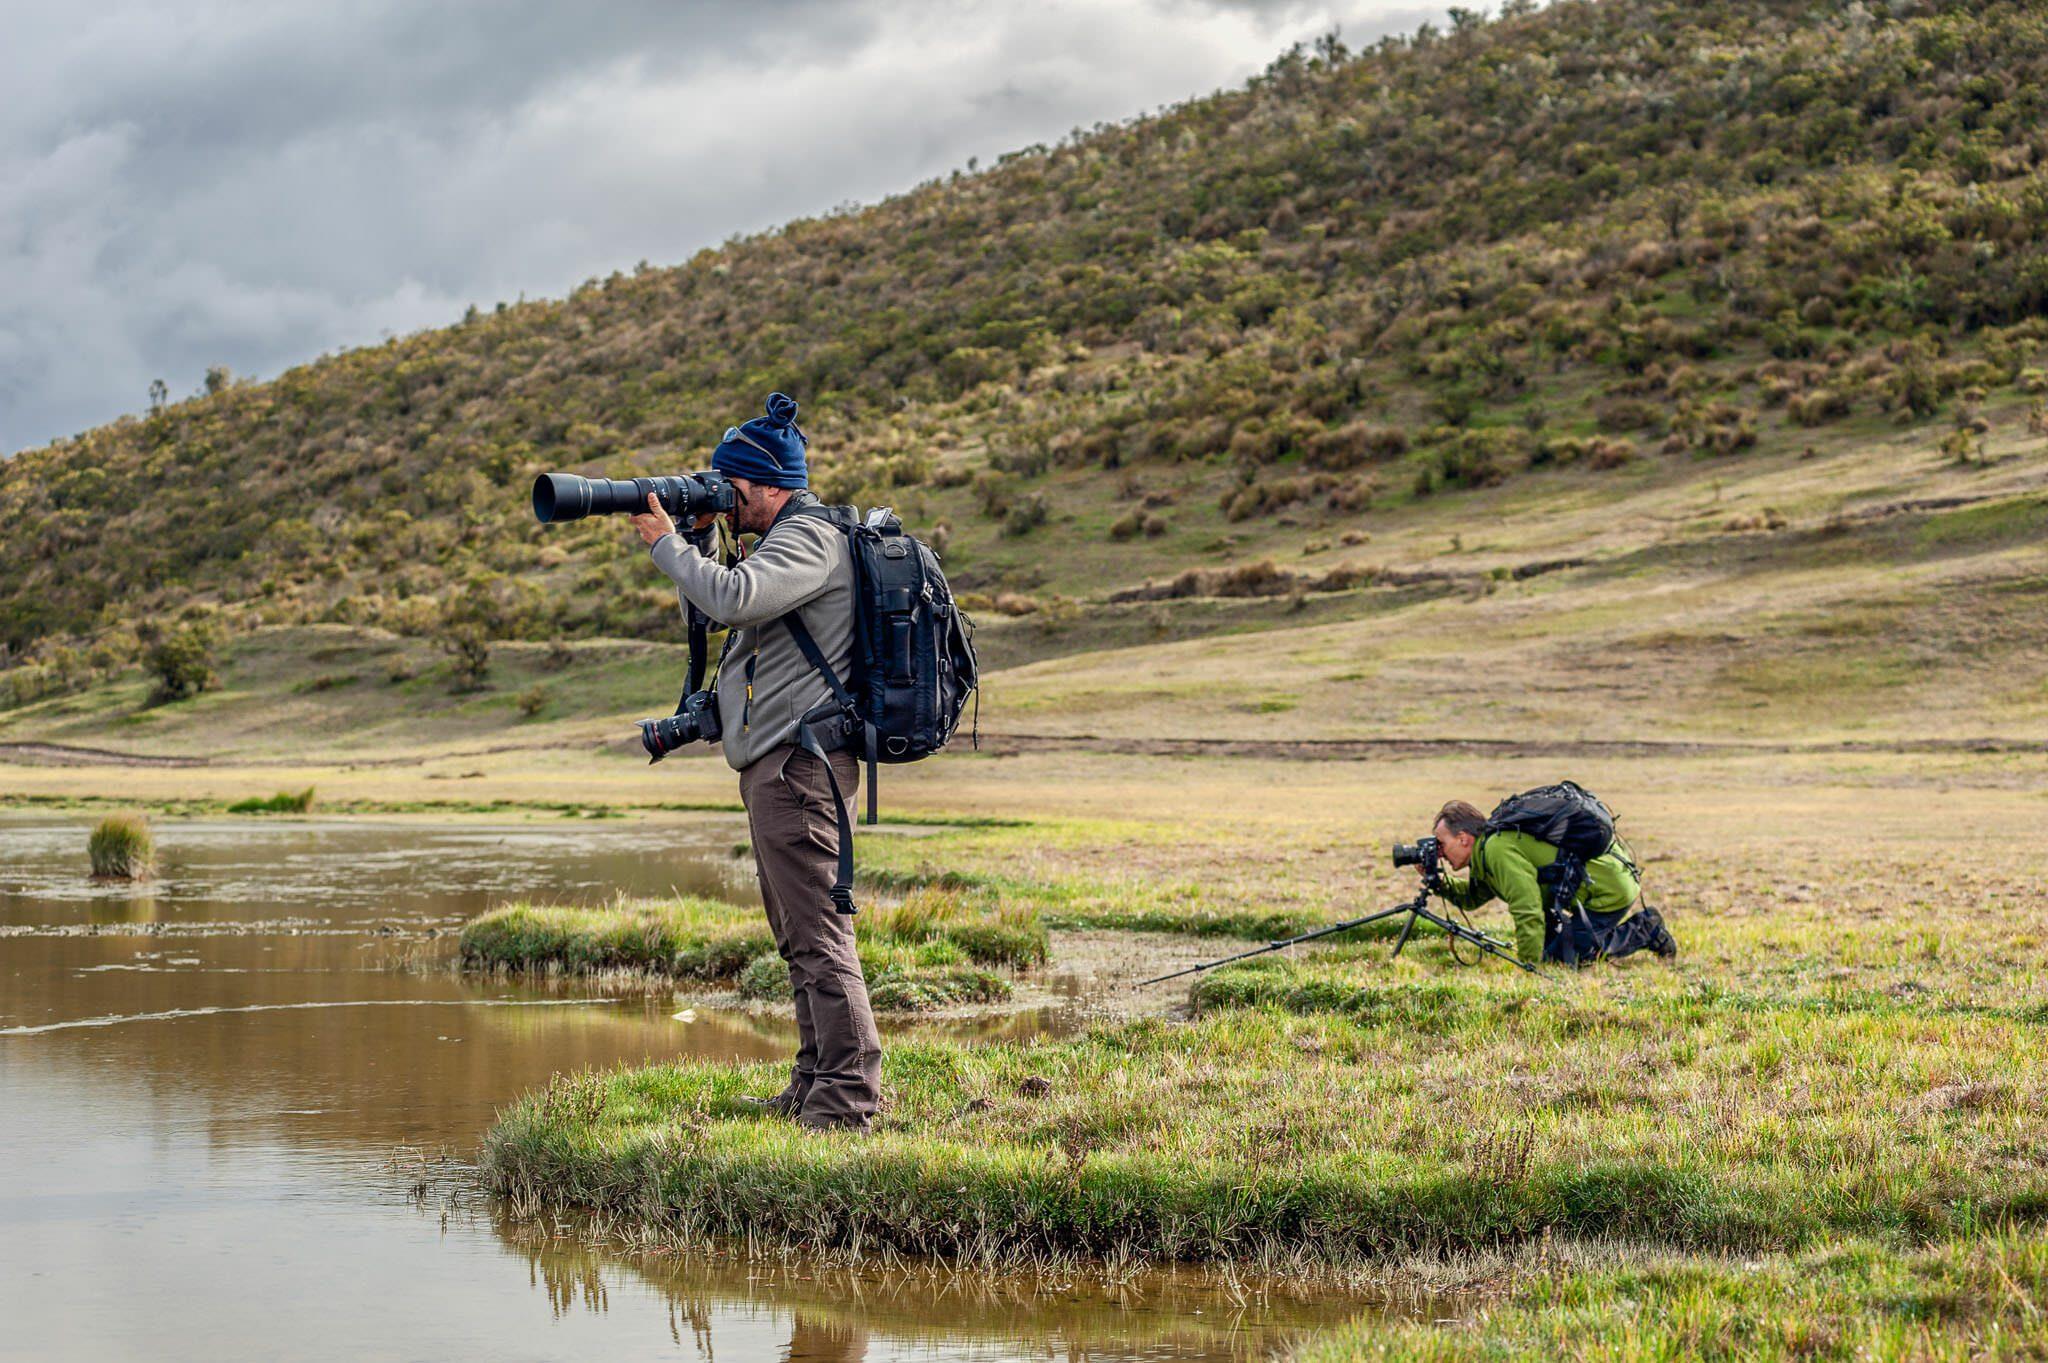 Guiding photographers